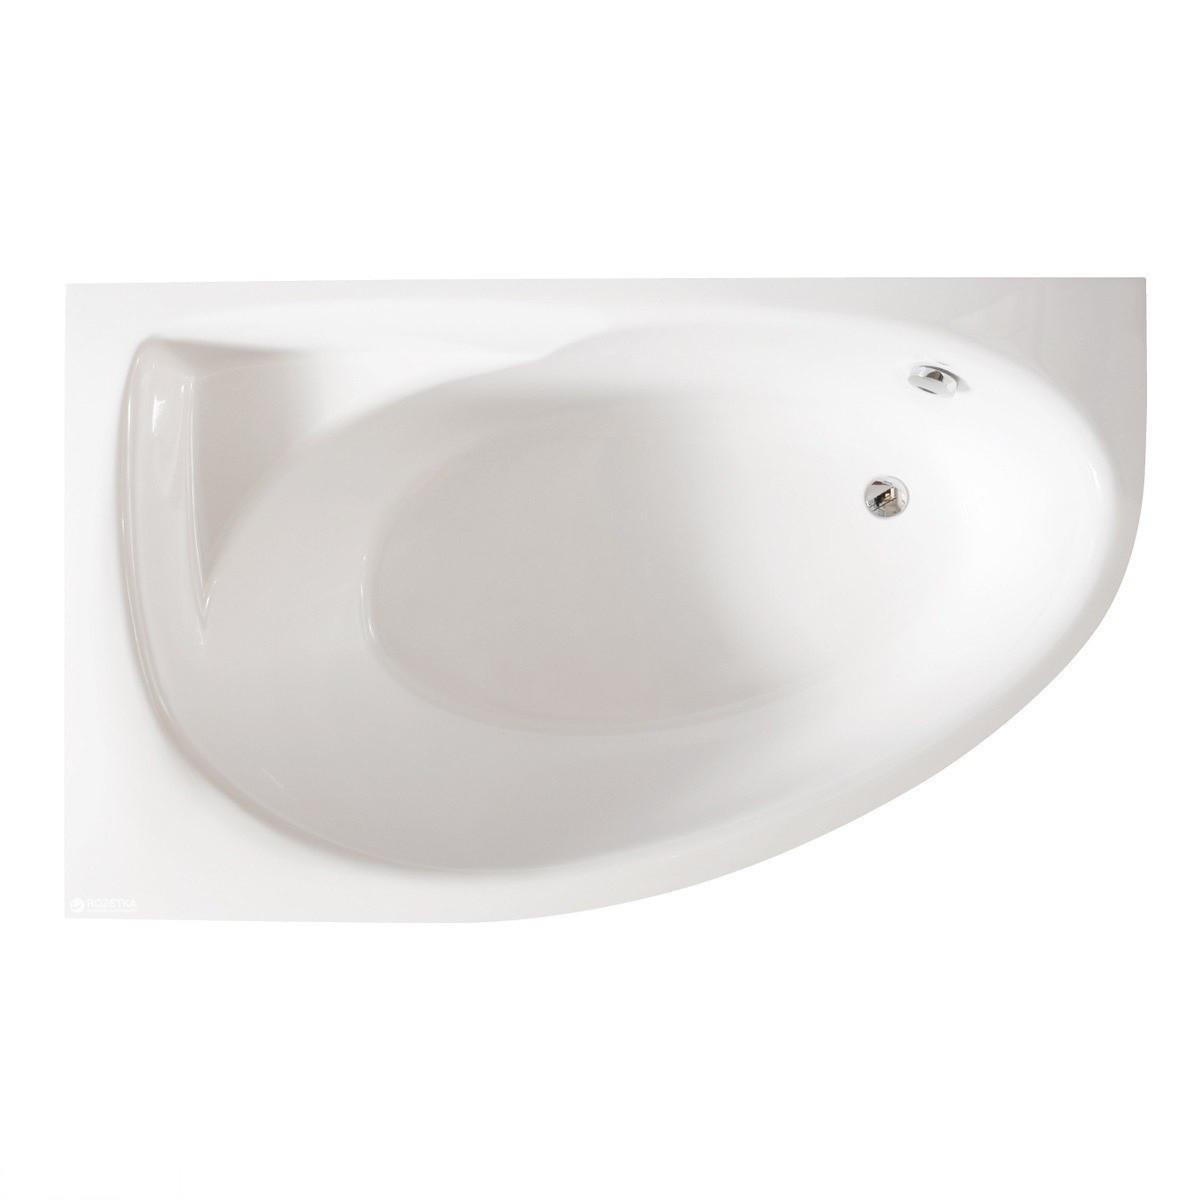 Ванна з штучного каменю PAA VATREGR/L/00+PATREGRM/00+SIFVUNOP TRE GRANDE Ванна 170х100 з панеллю, права, біла